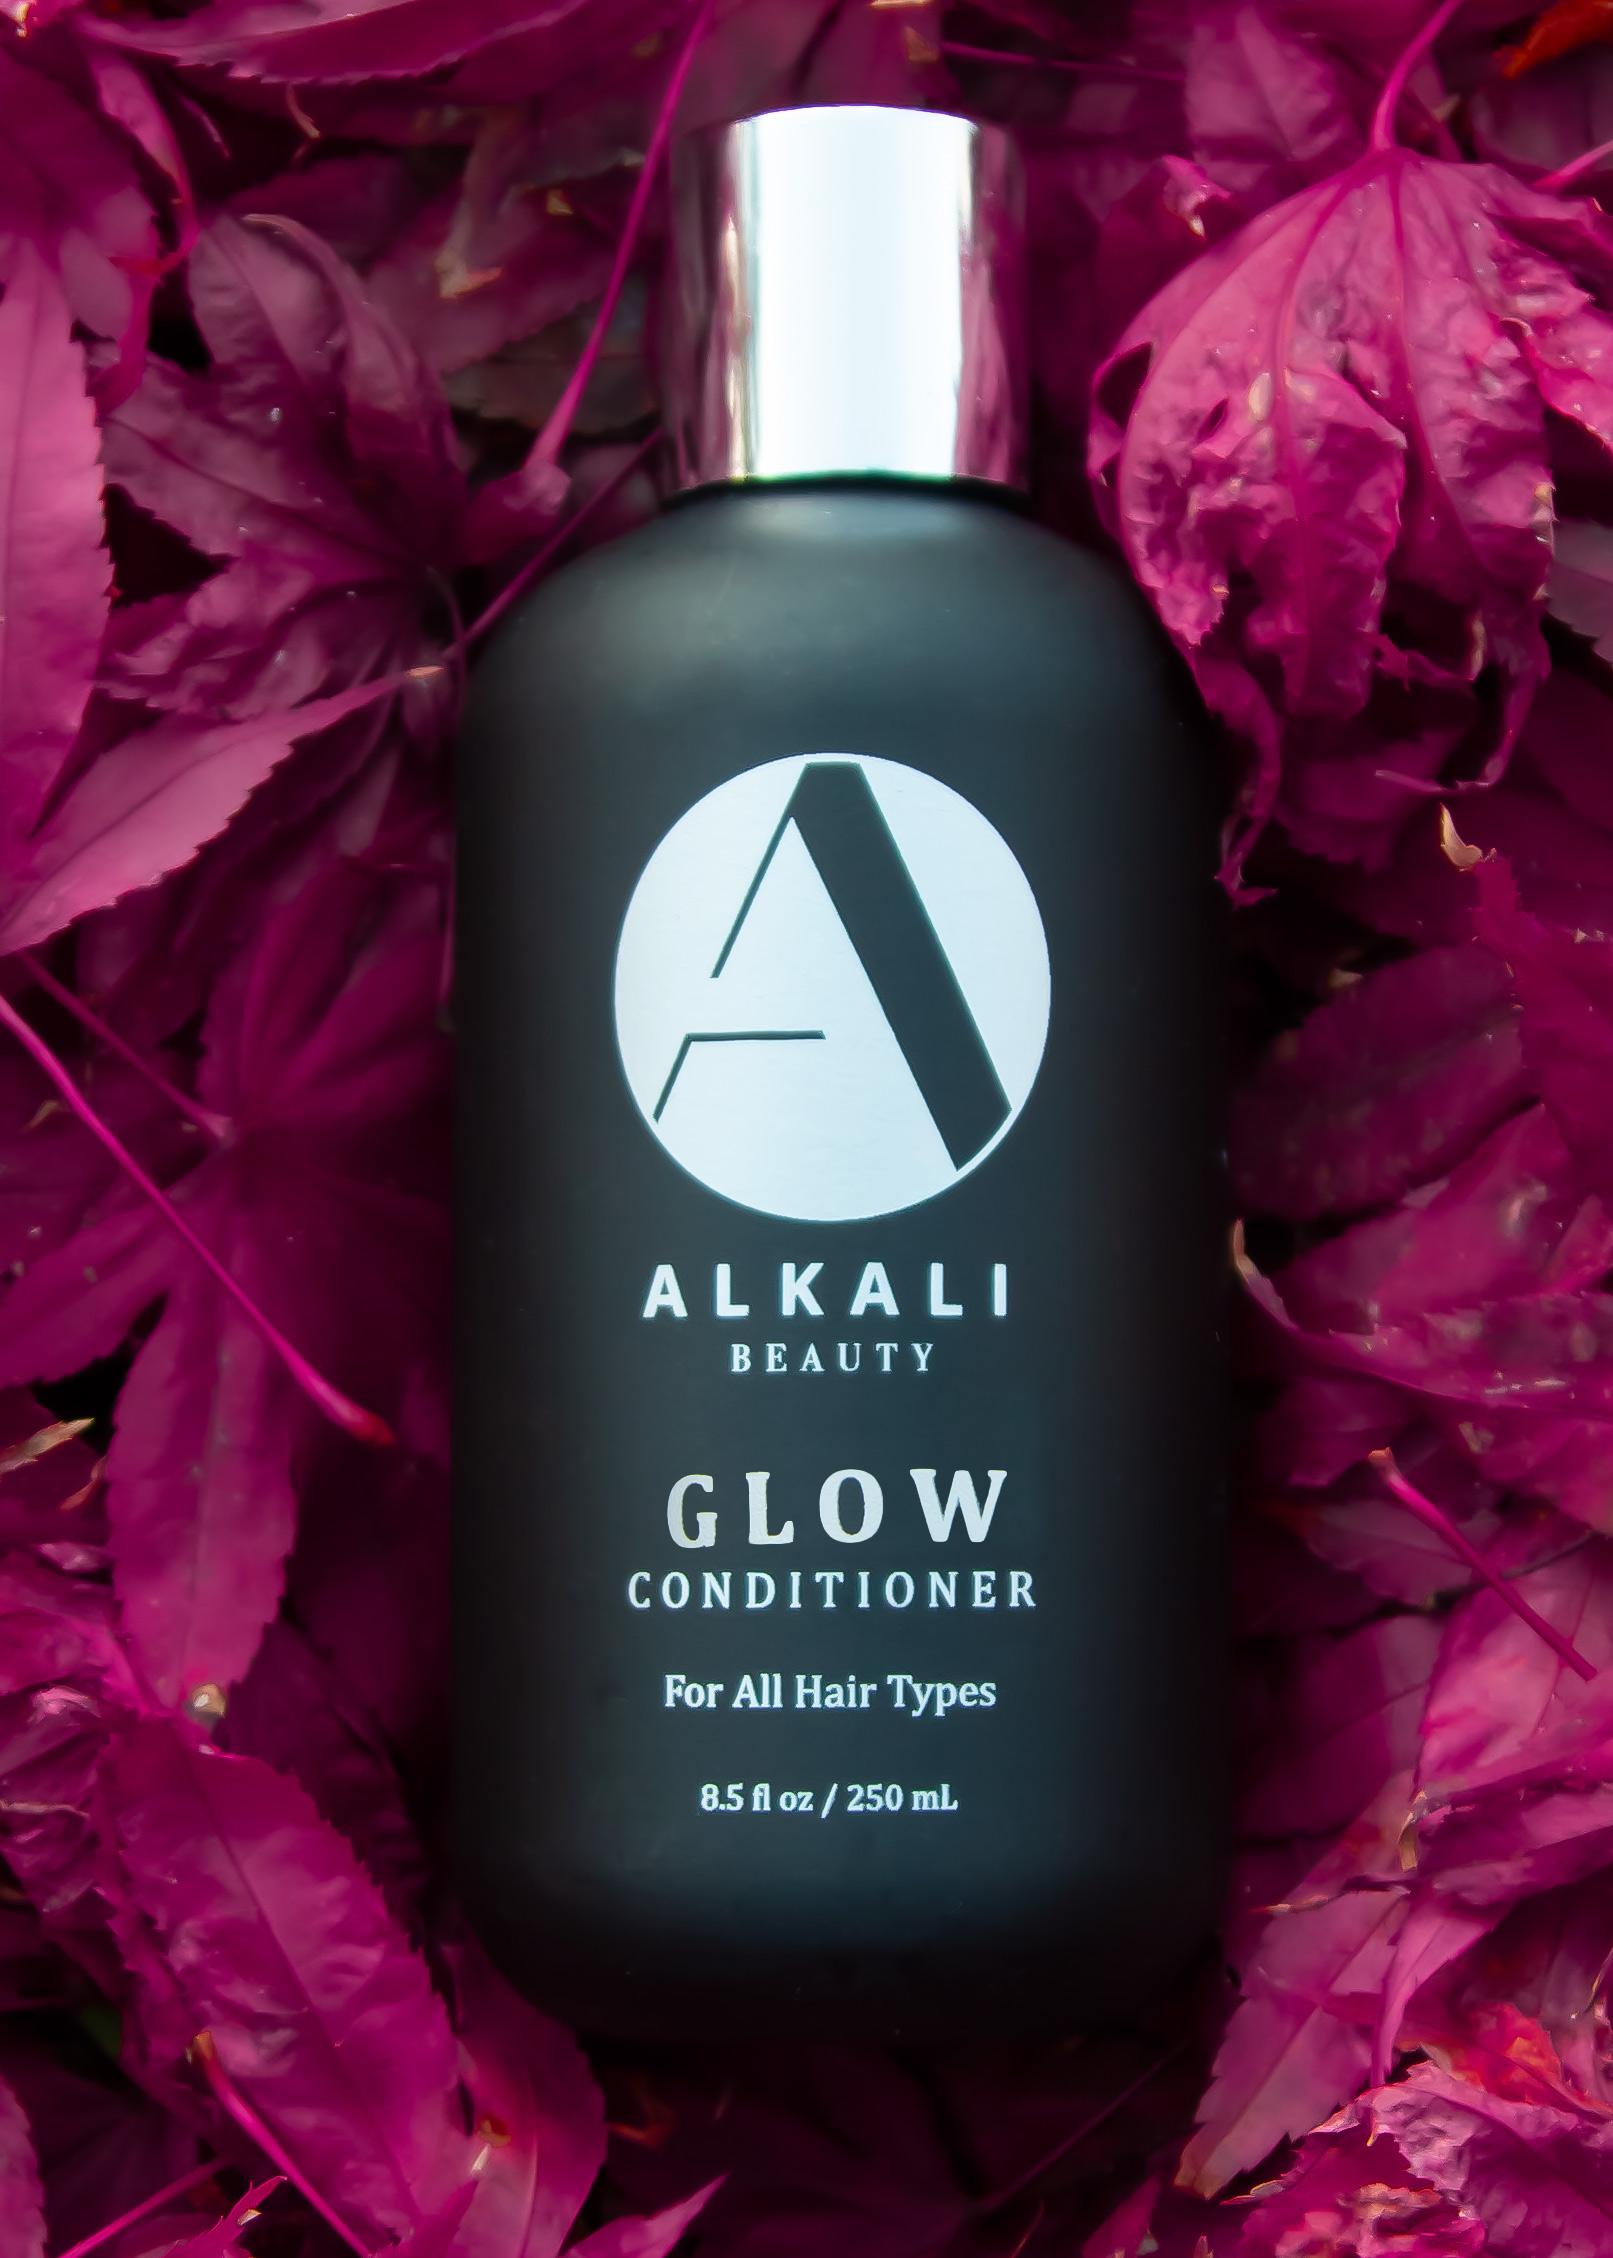 Alkali Beauty GLOW Conditioner